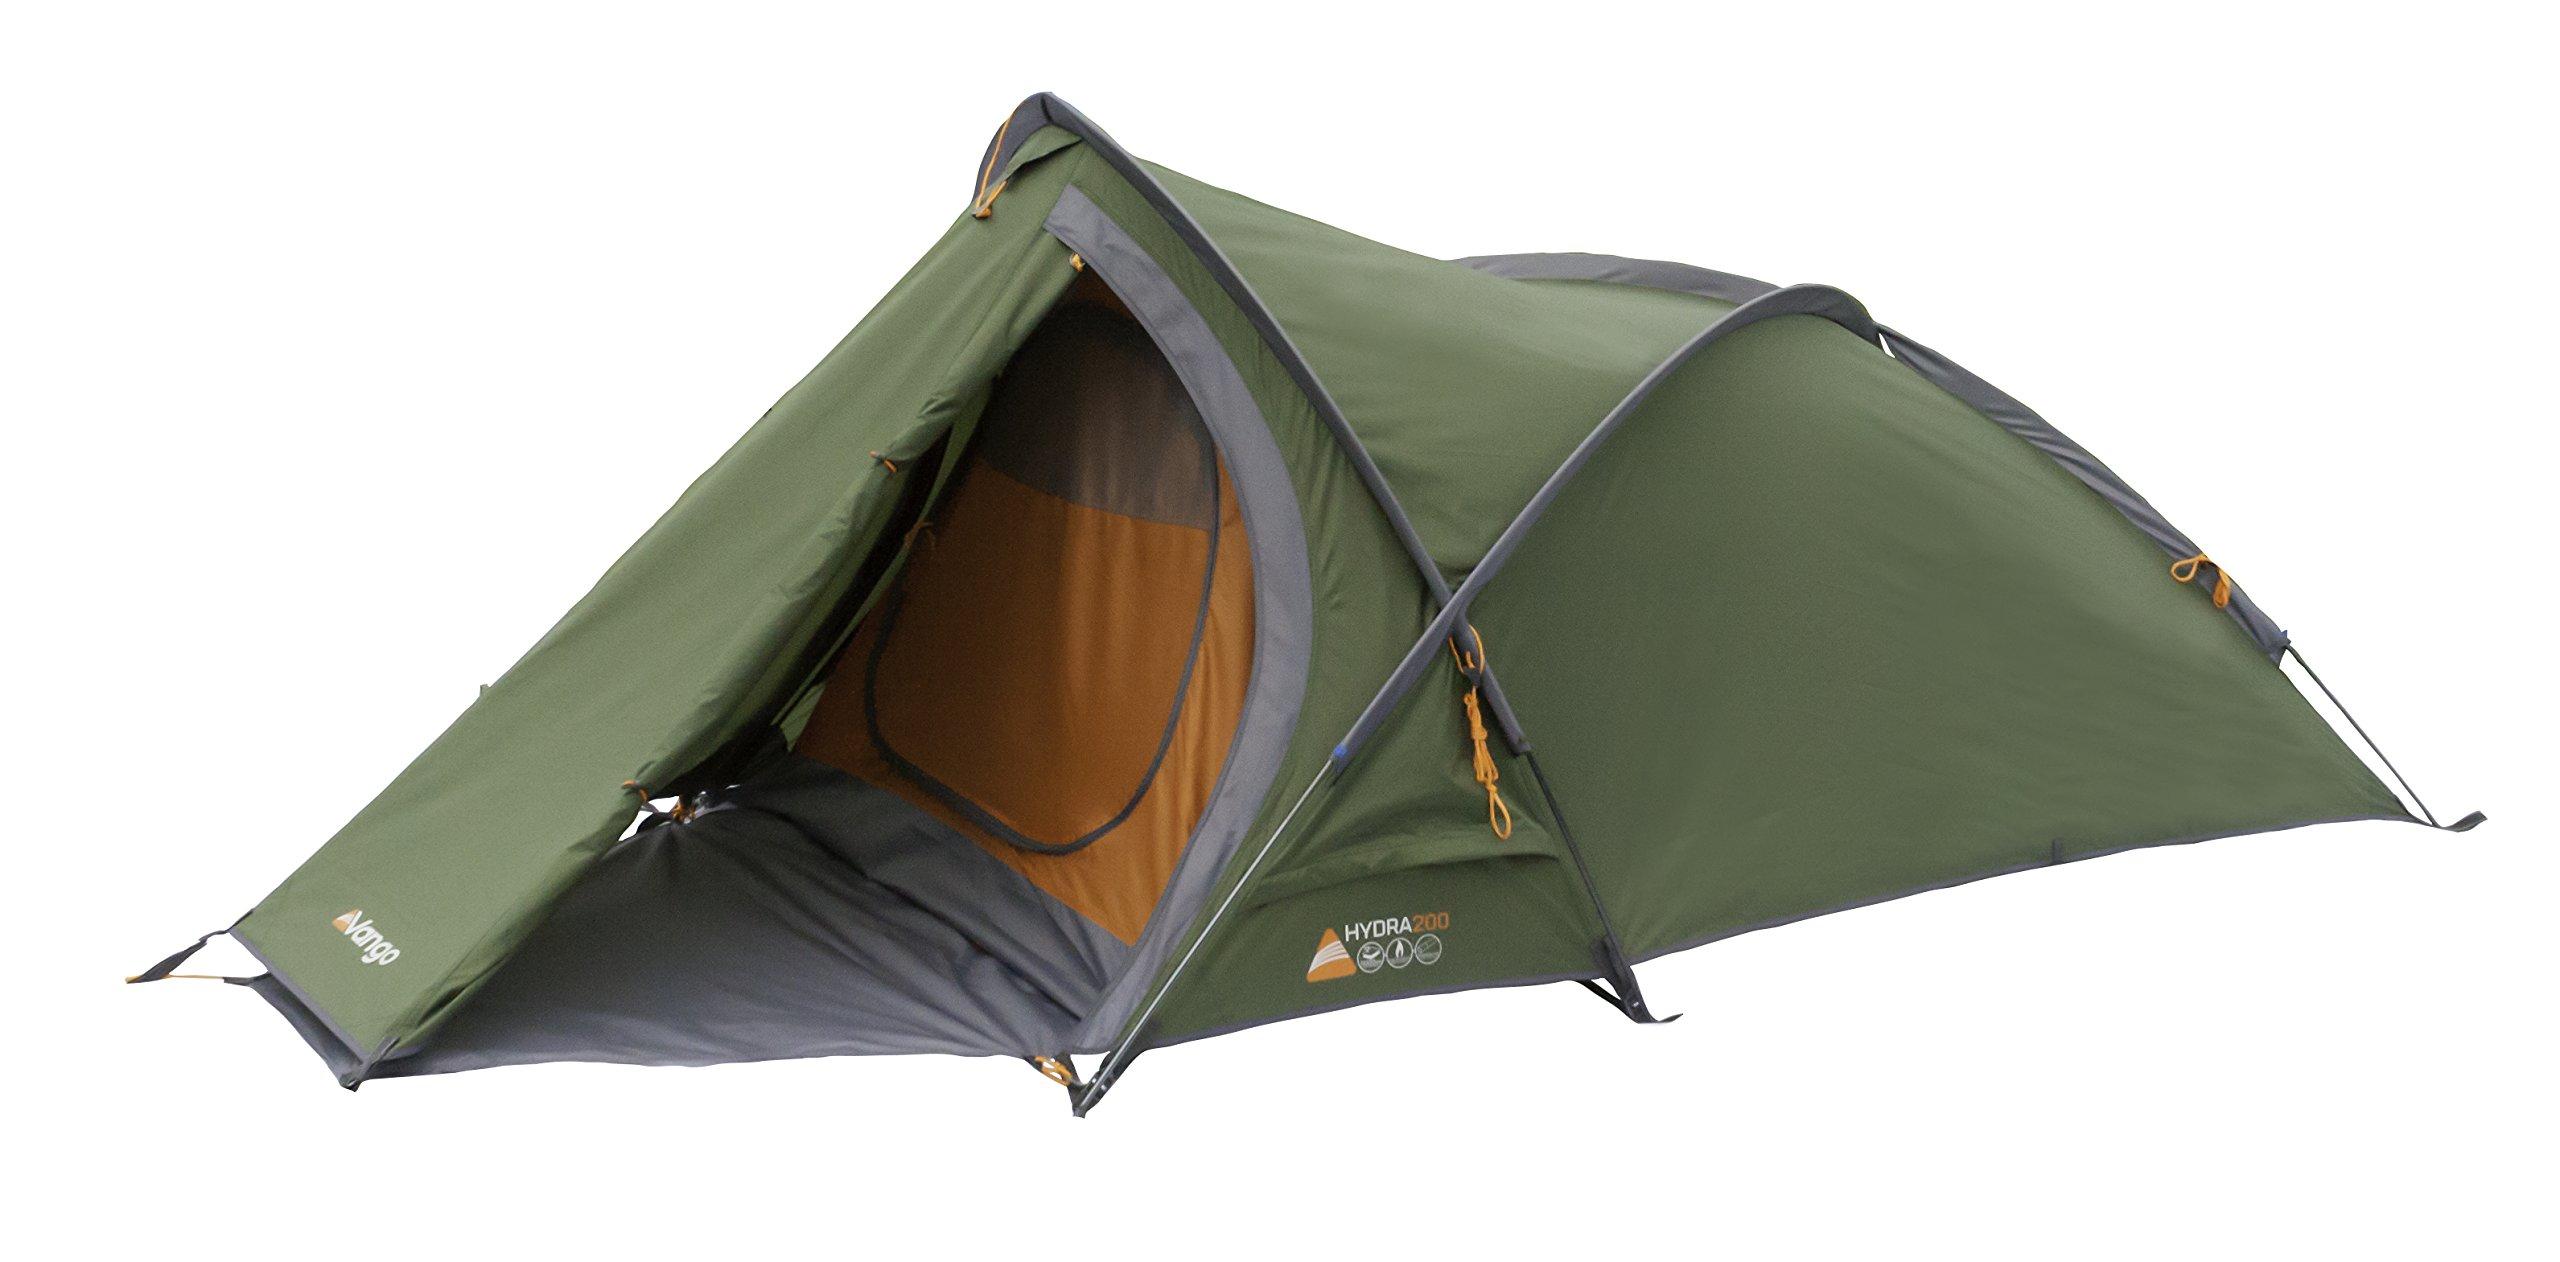 Vango Hydra Trekking Tent, Cactus Green, 200 1